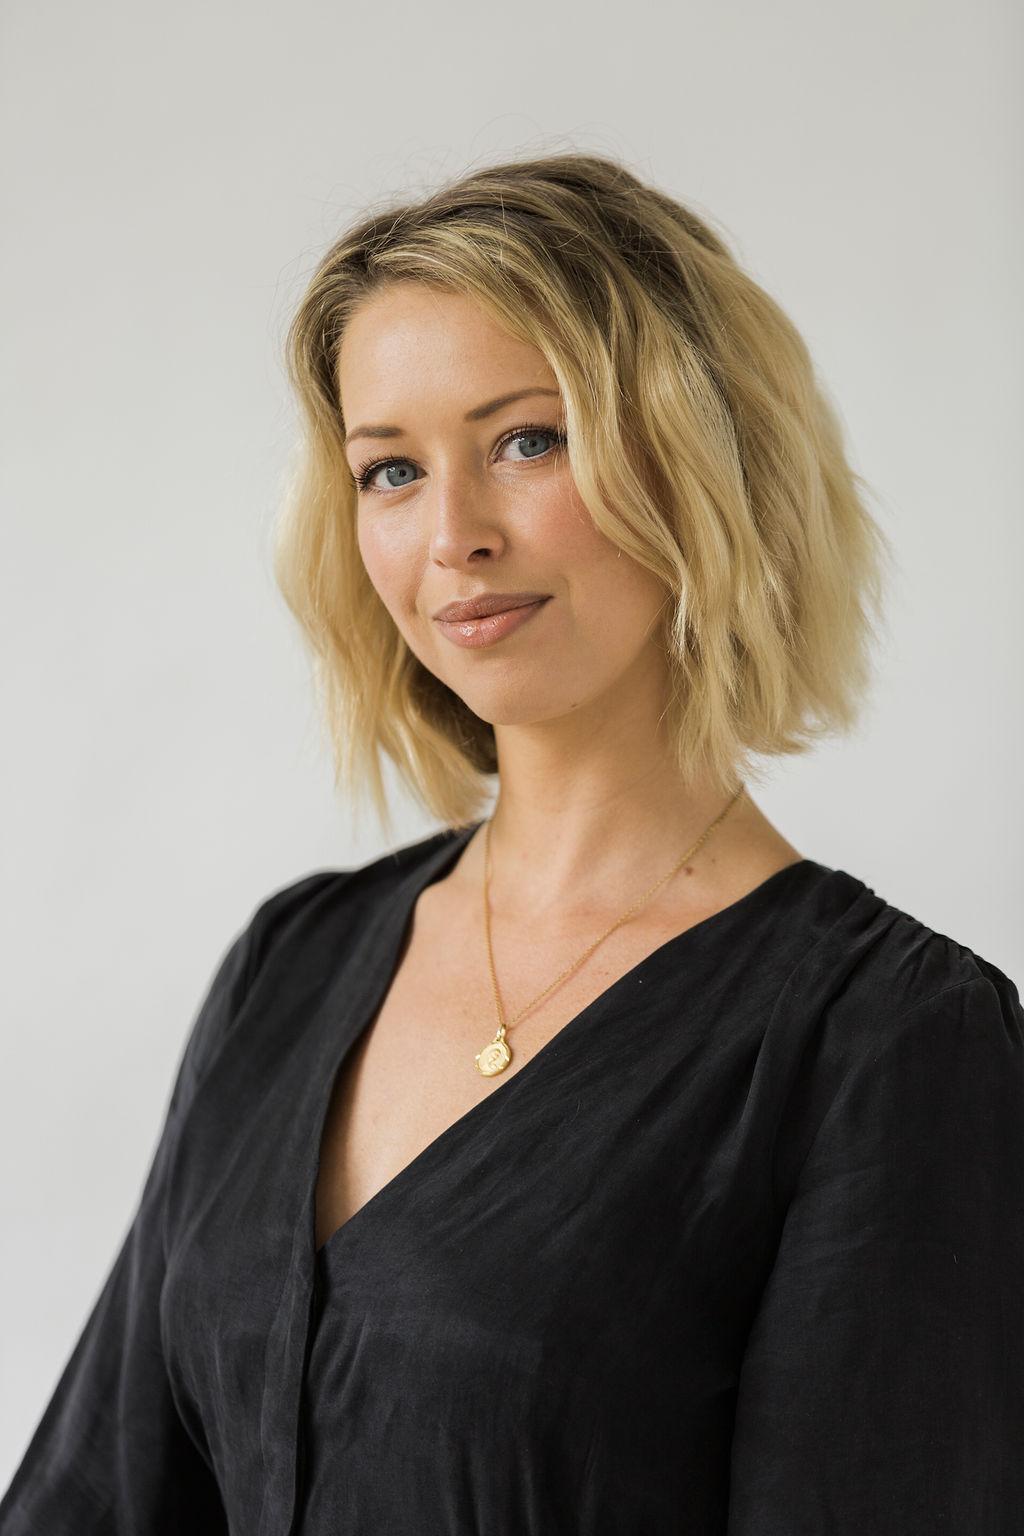 Hairstylist Elli